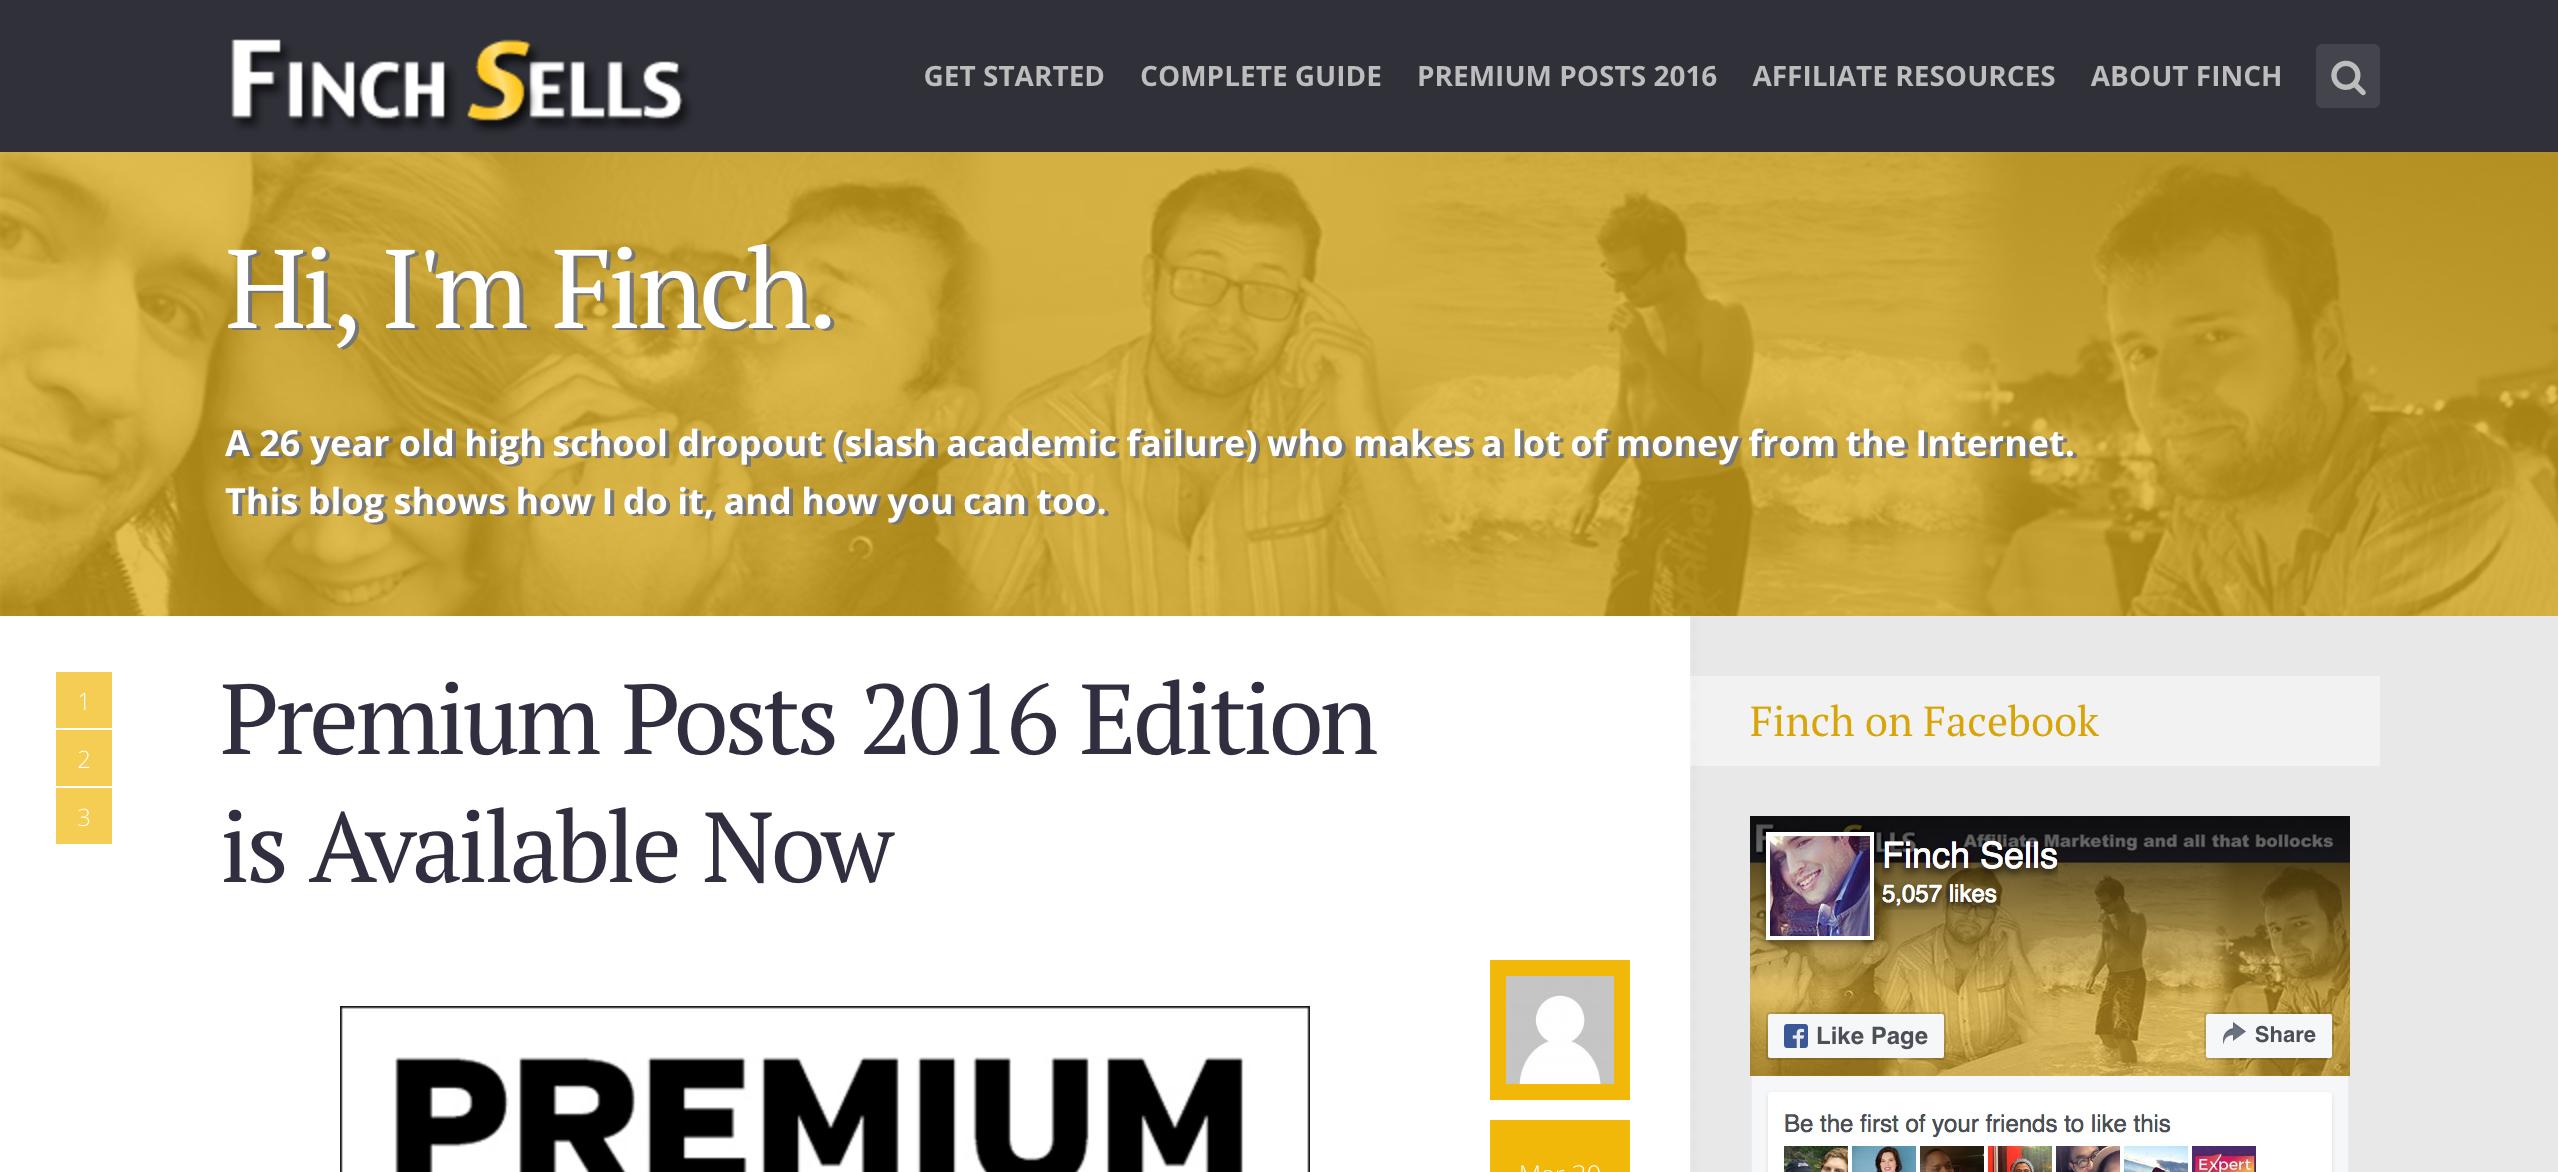 Finch Sells Affiliate Blog